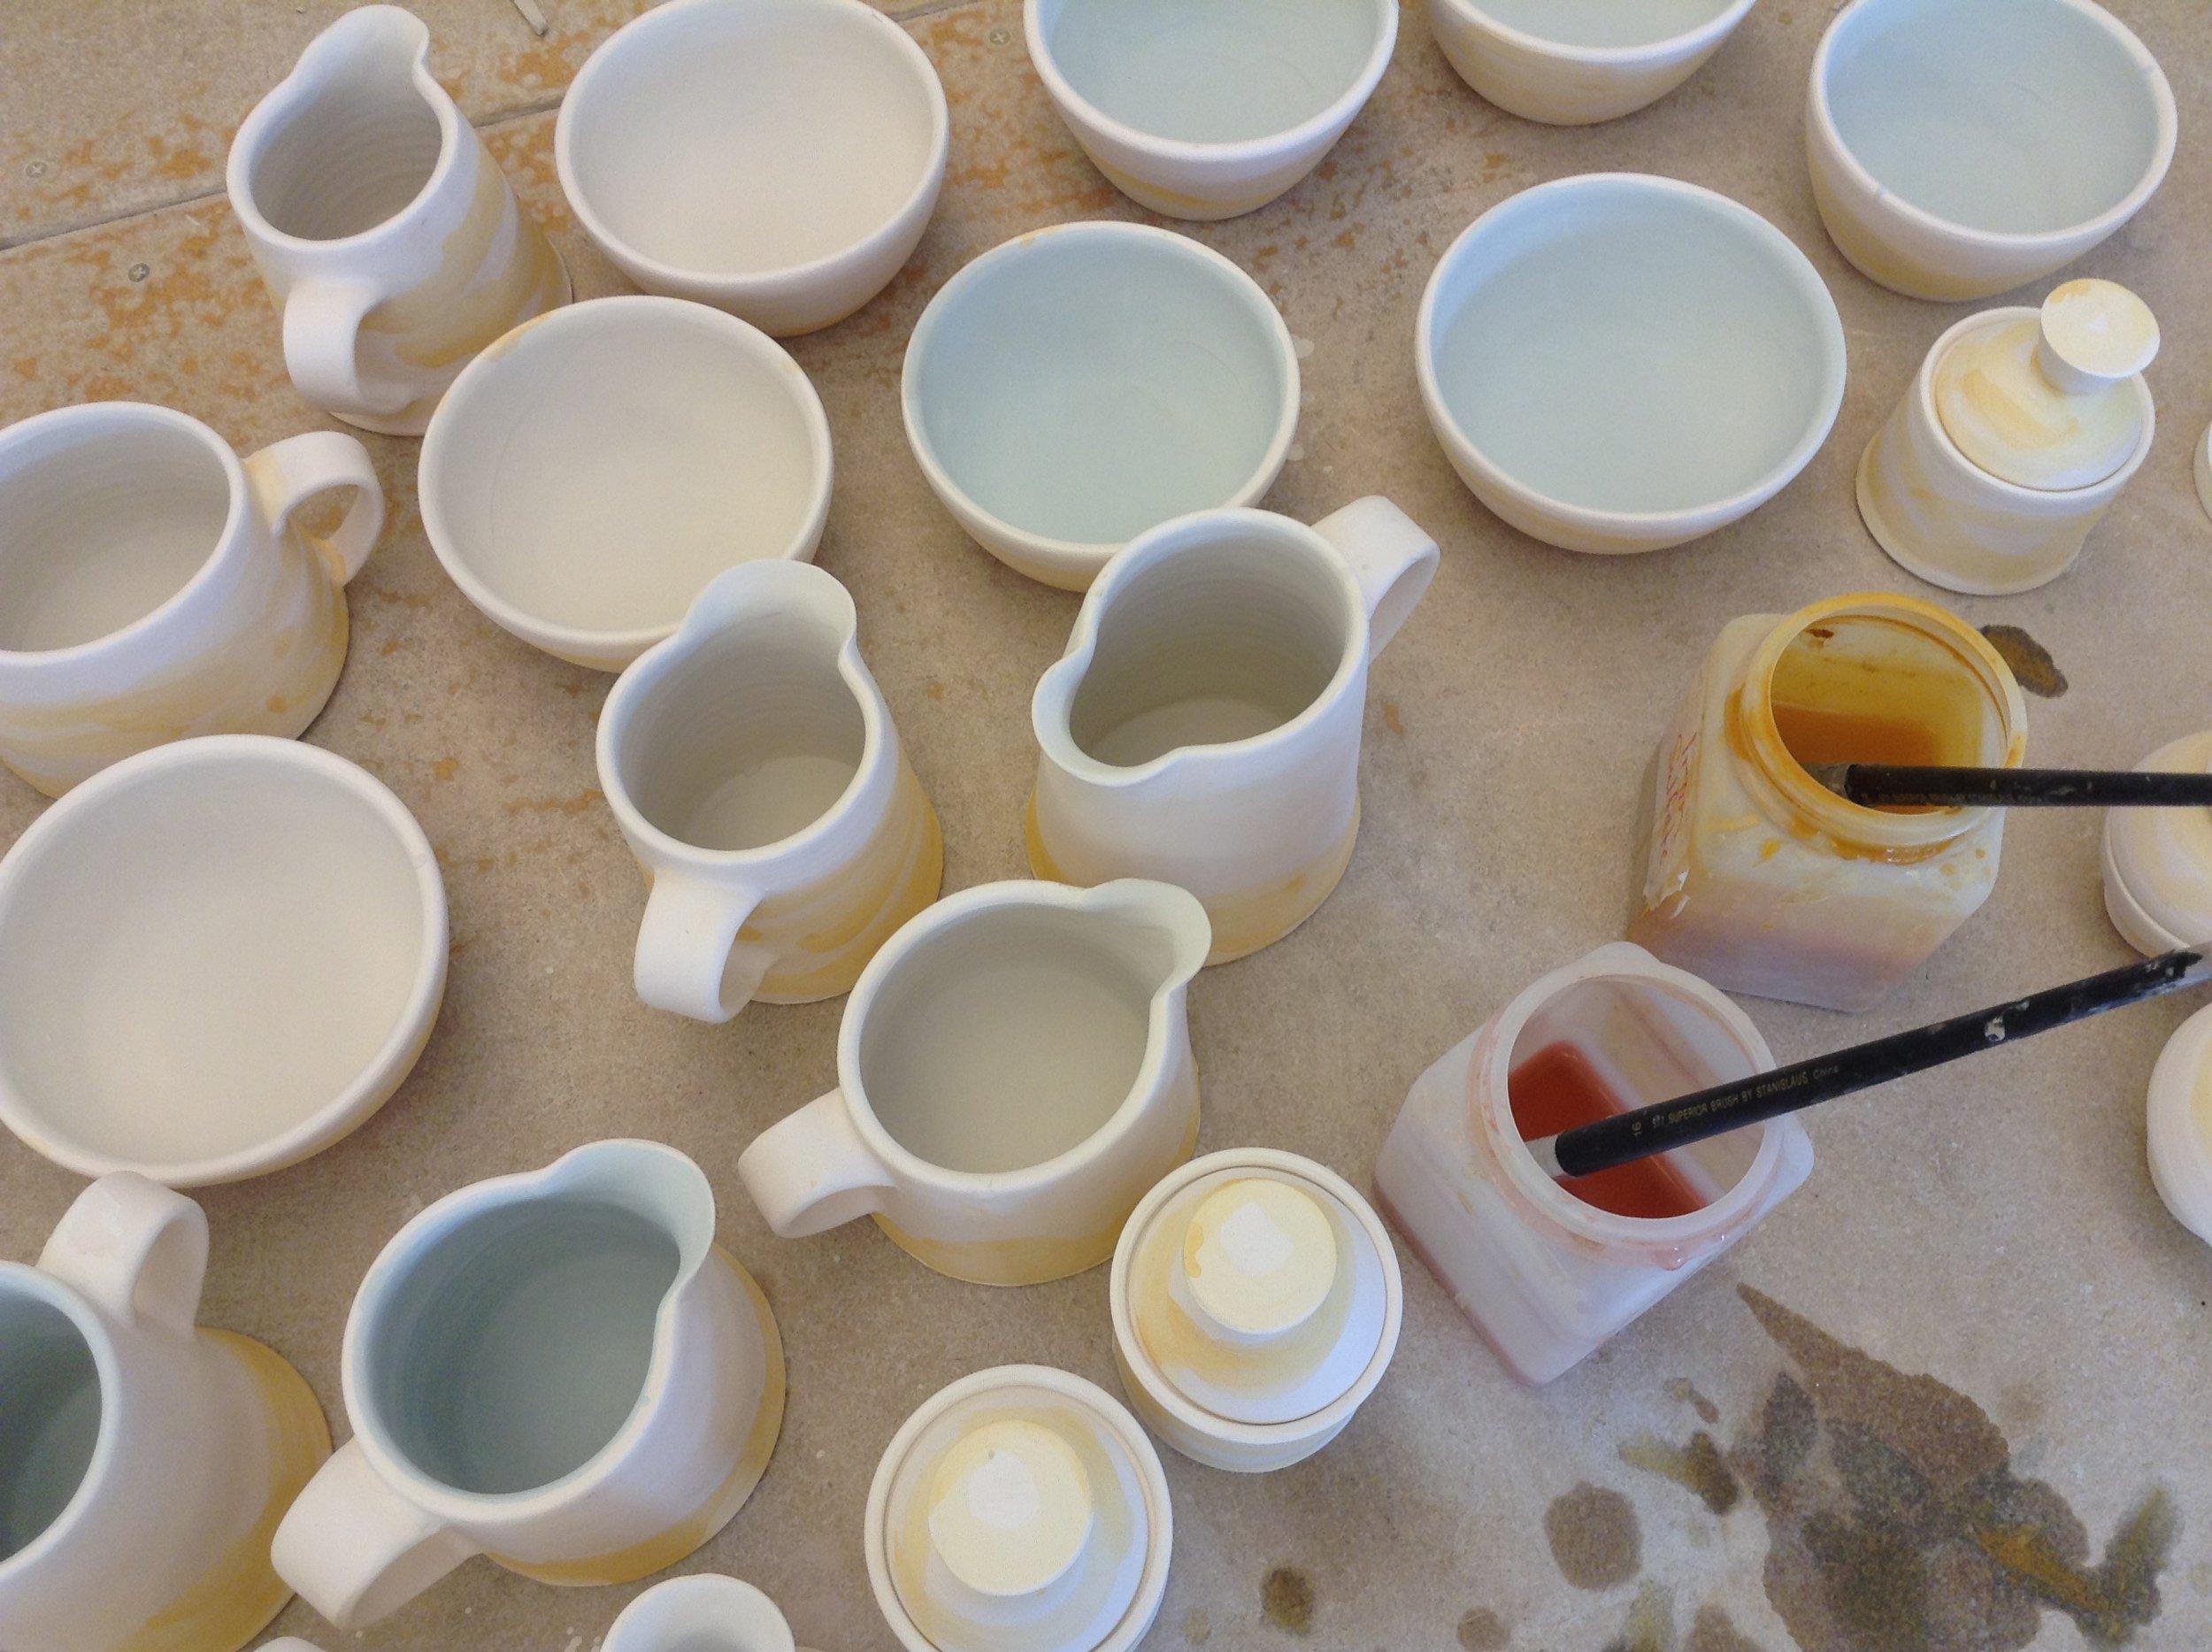 Prep for Soda Firing, staining & glazing